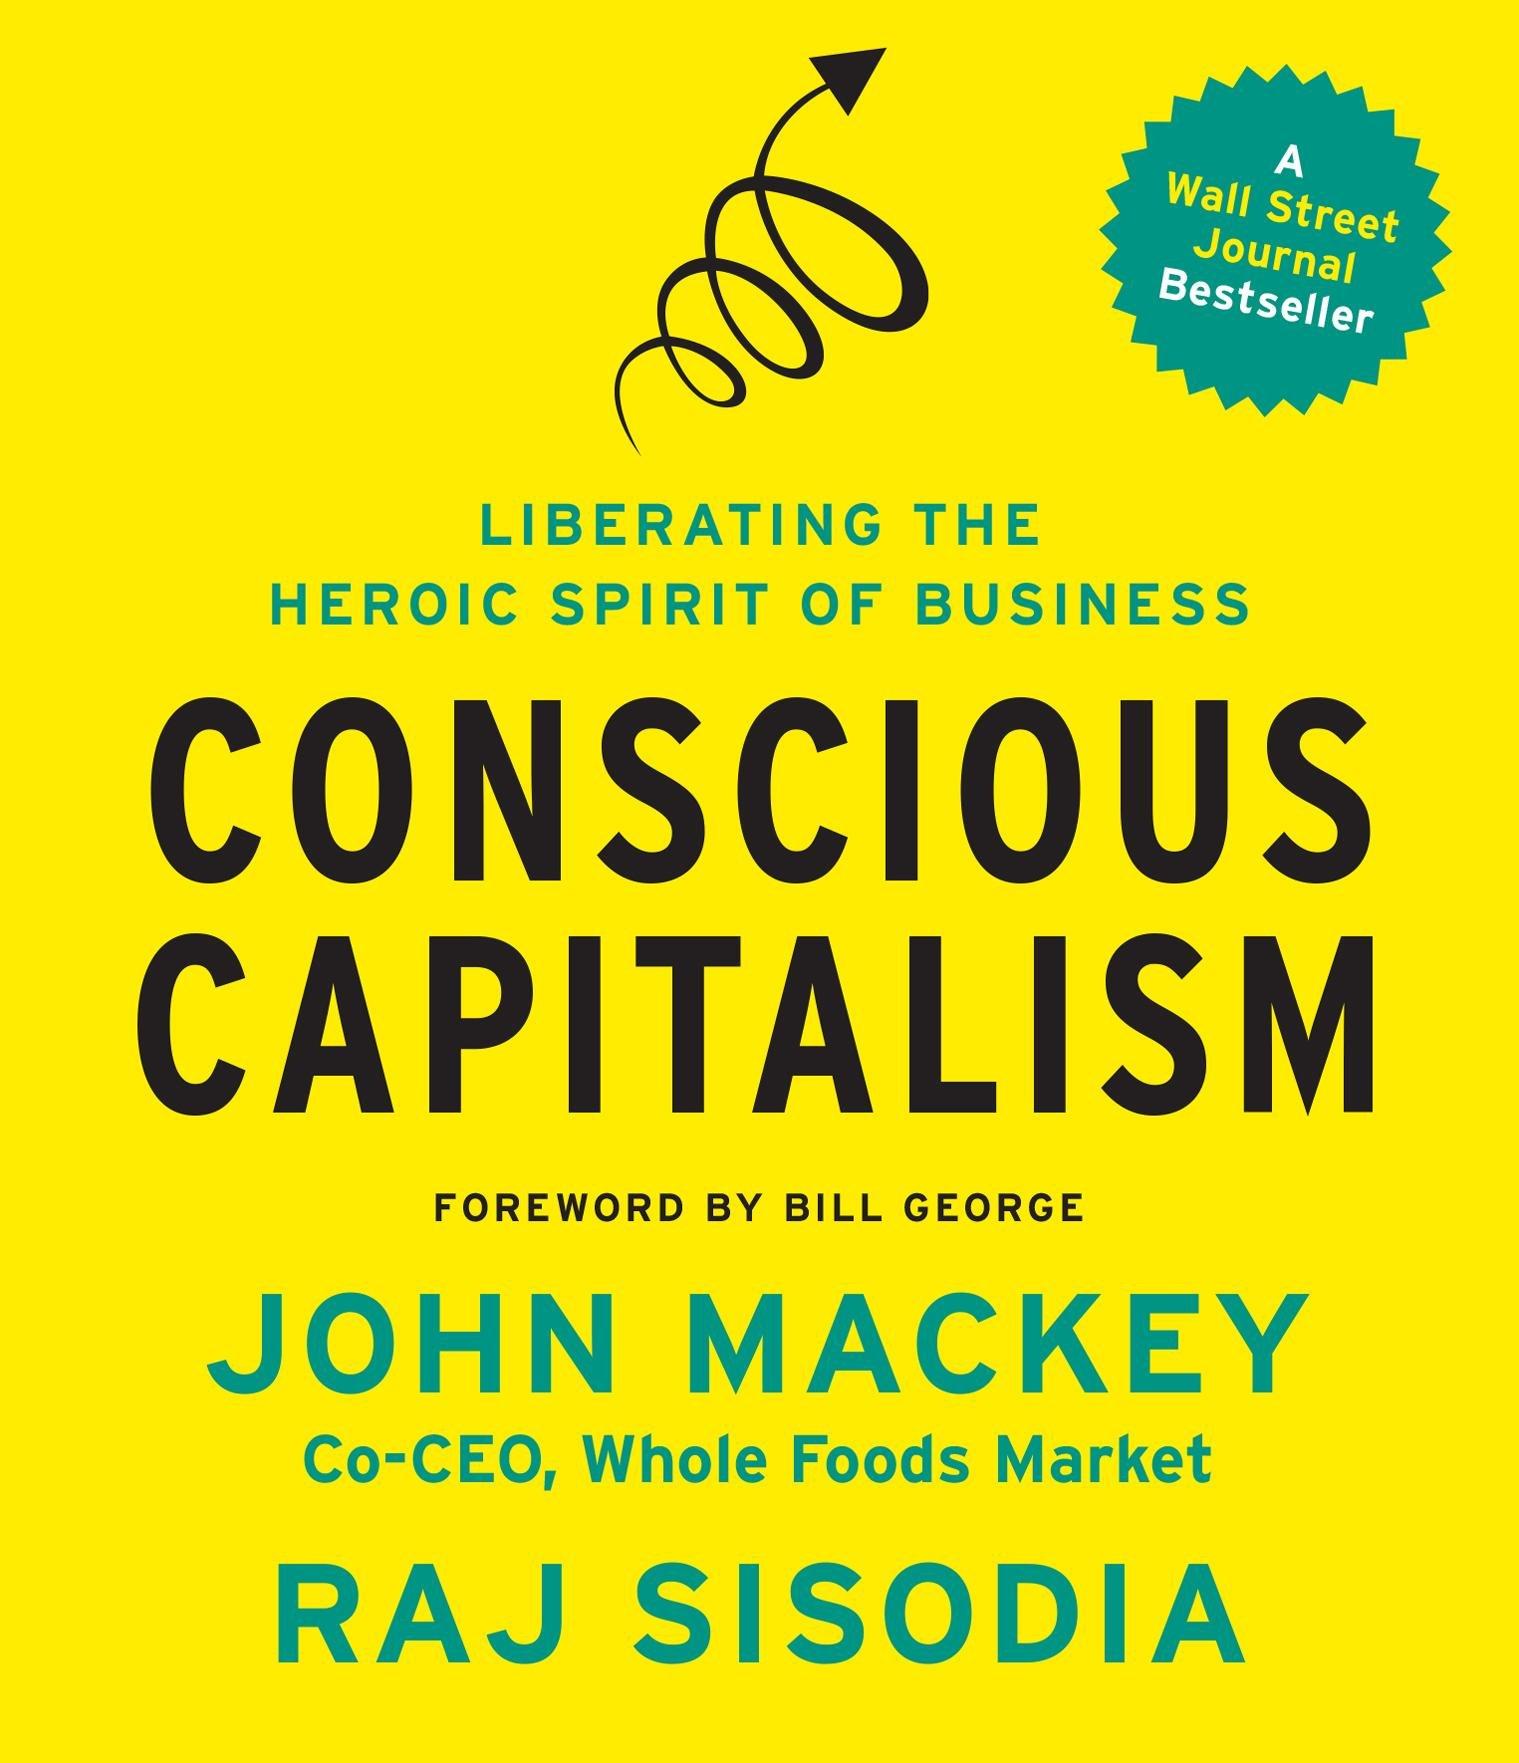 Conscious Capitalism: Liberating the Heroic Spirit of Business